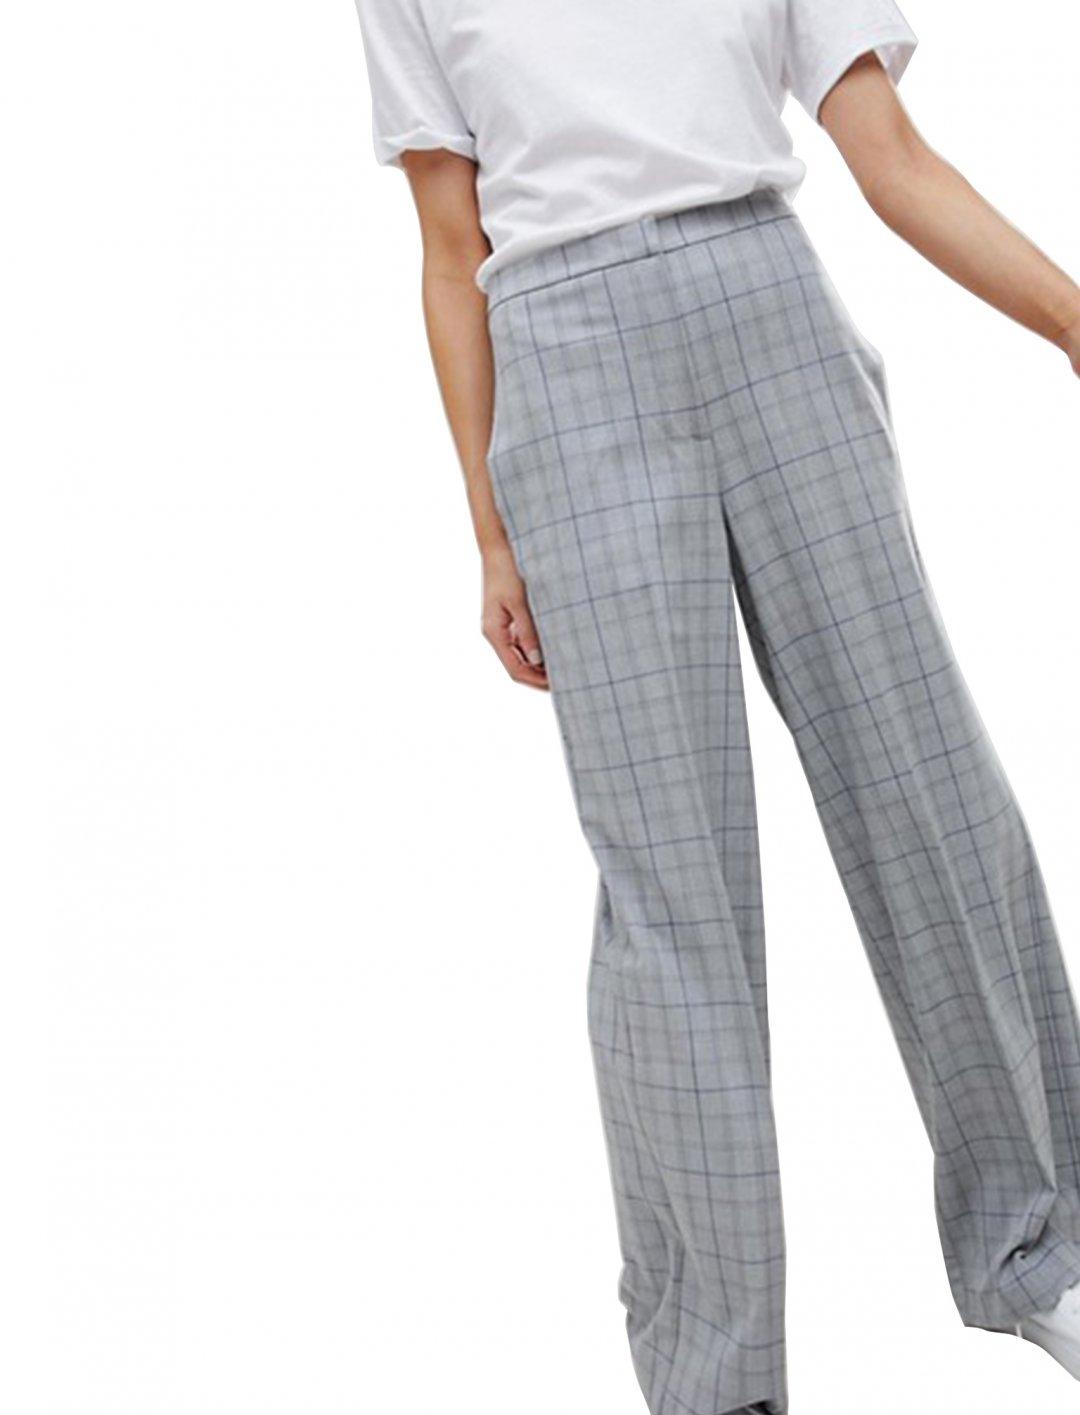 Asos Check Wide Leg Trousers Clothing Asos